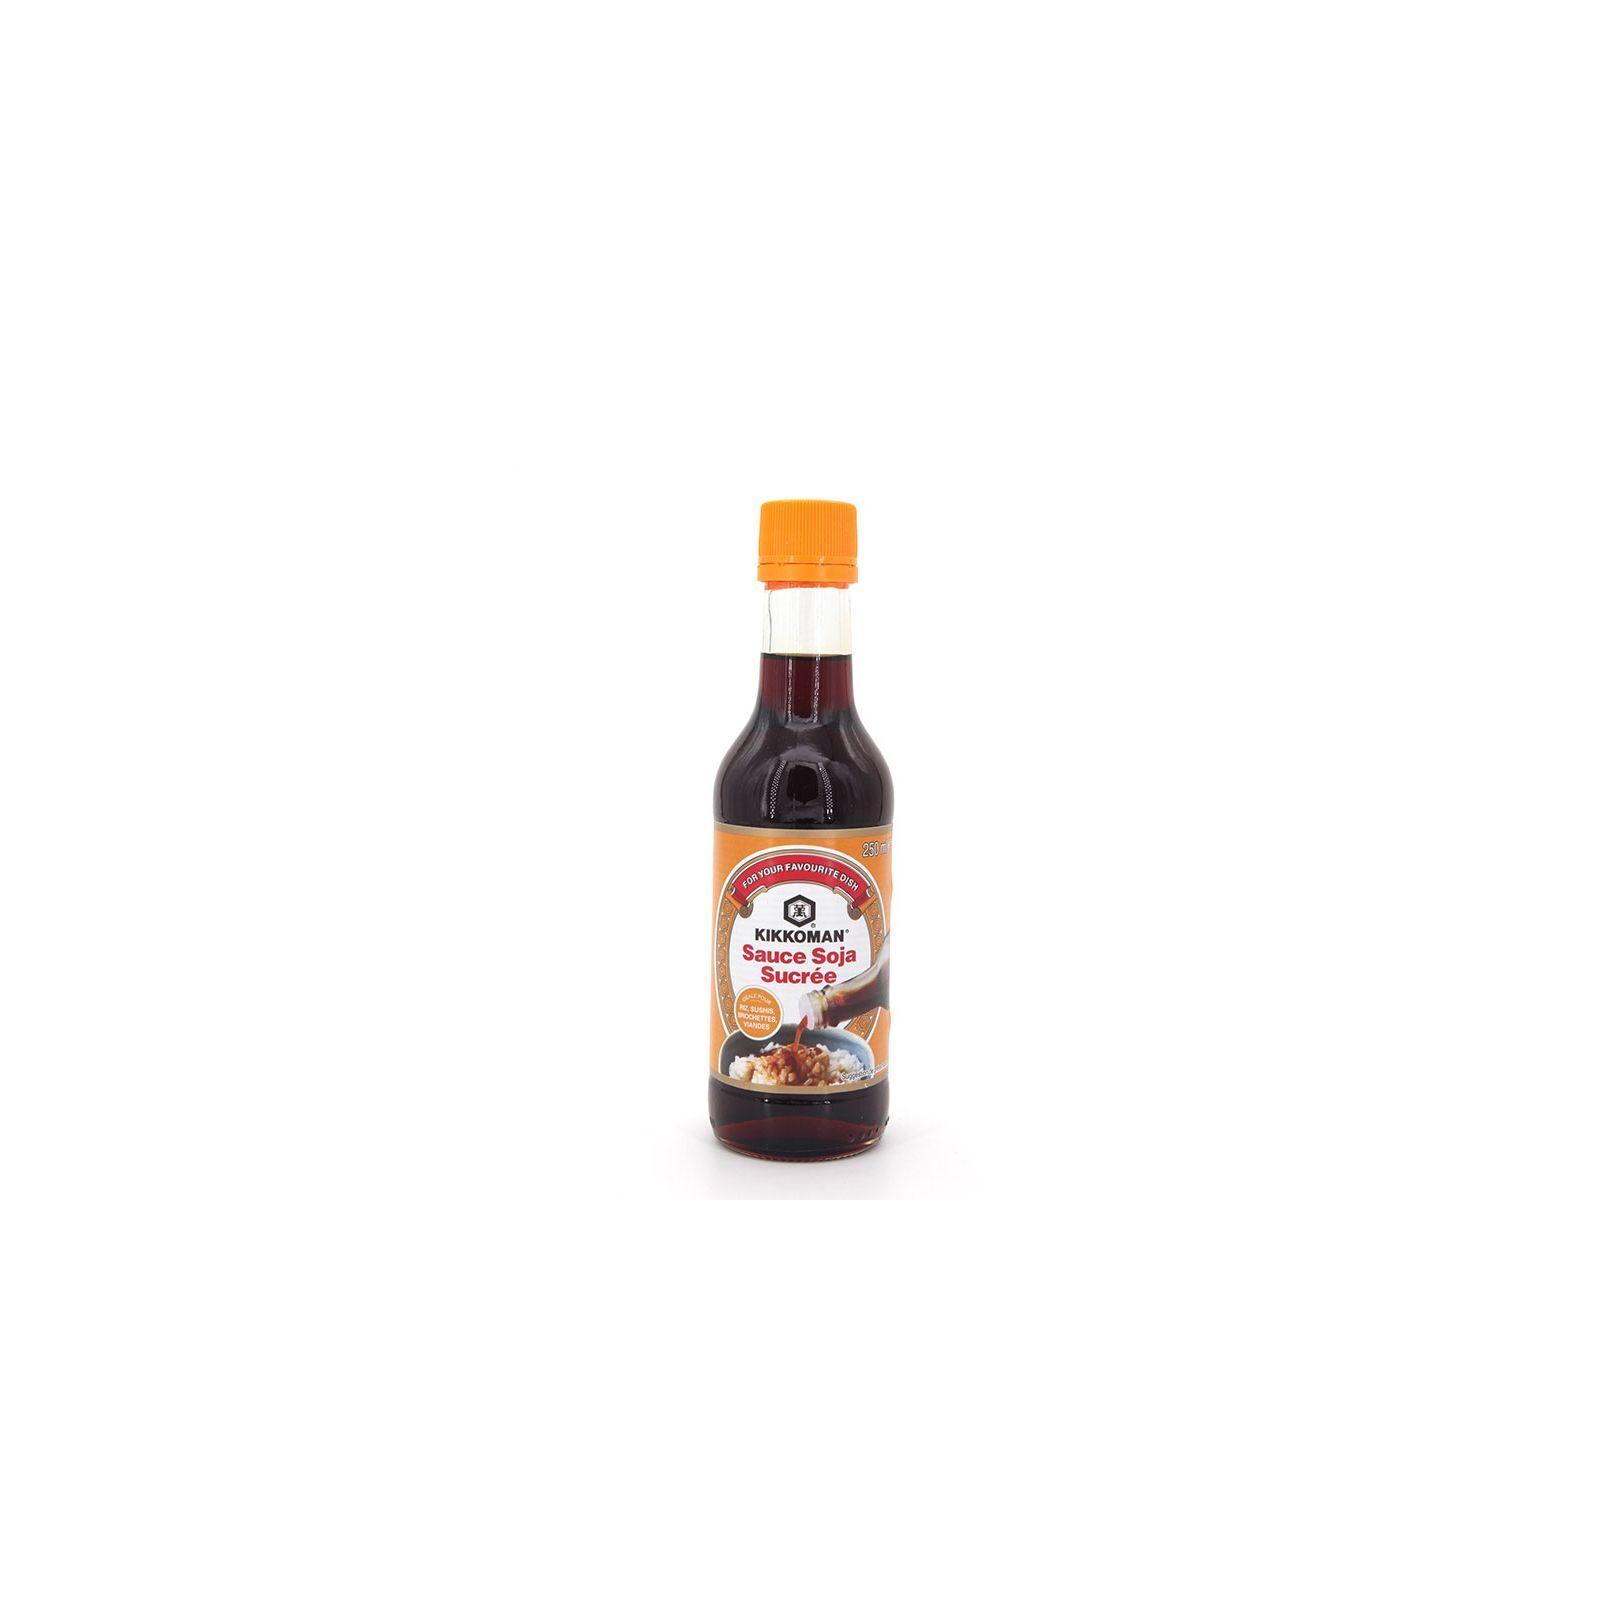 Asia Marché Sauce soja sucrée Kikkoman 975ml